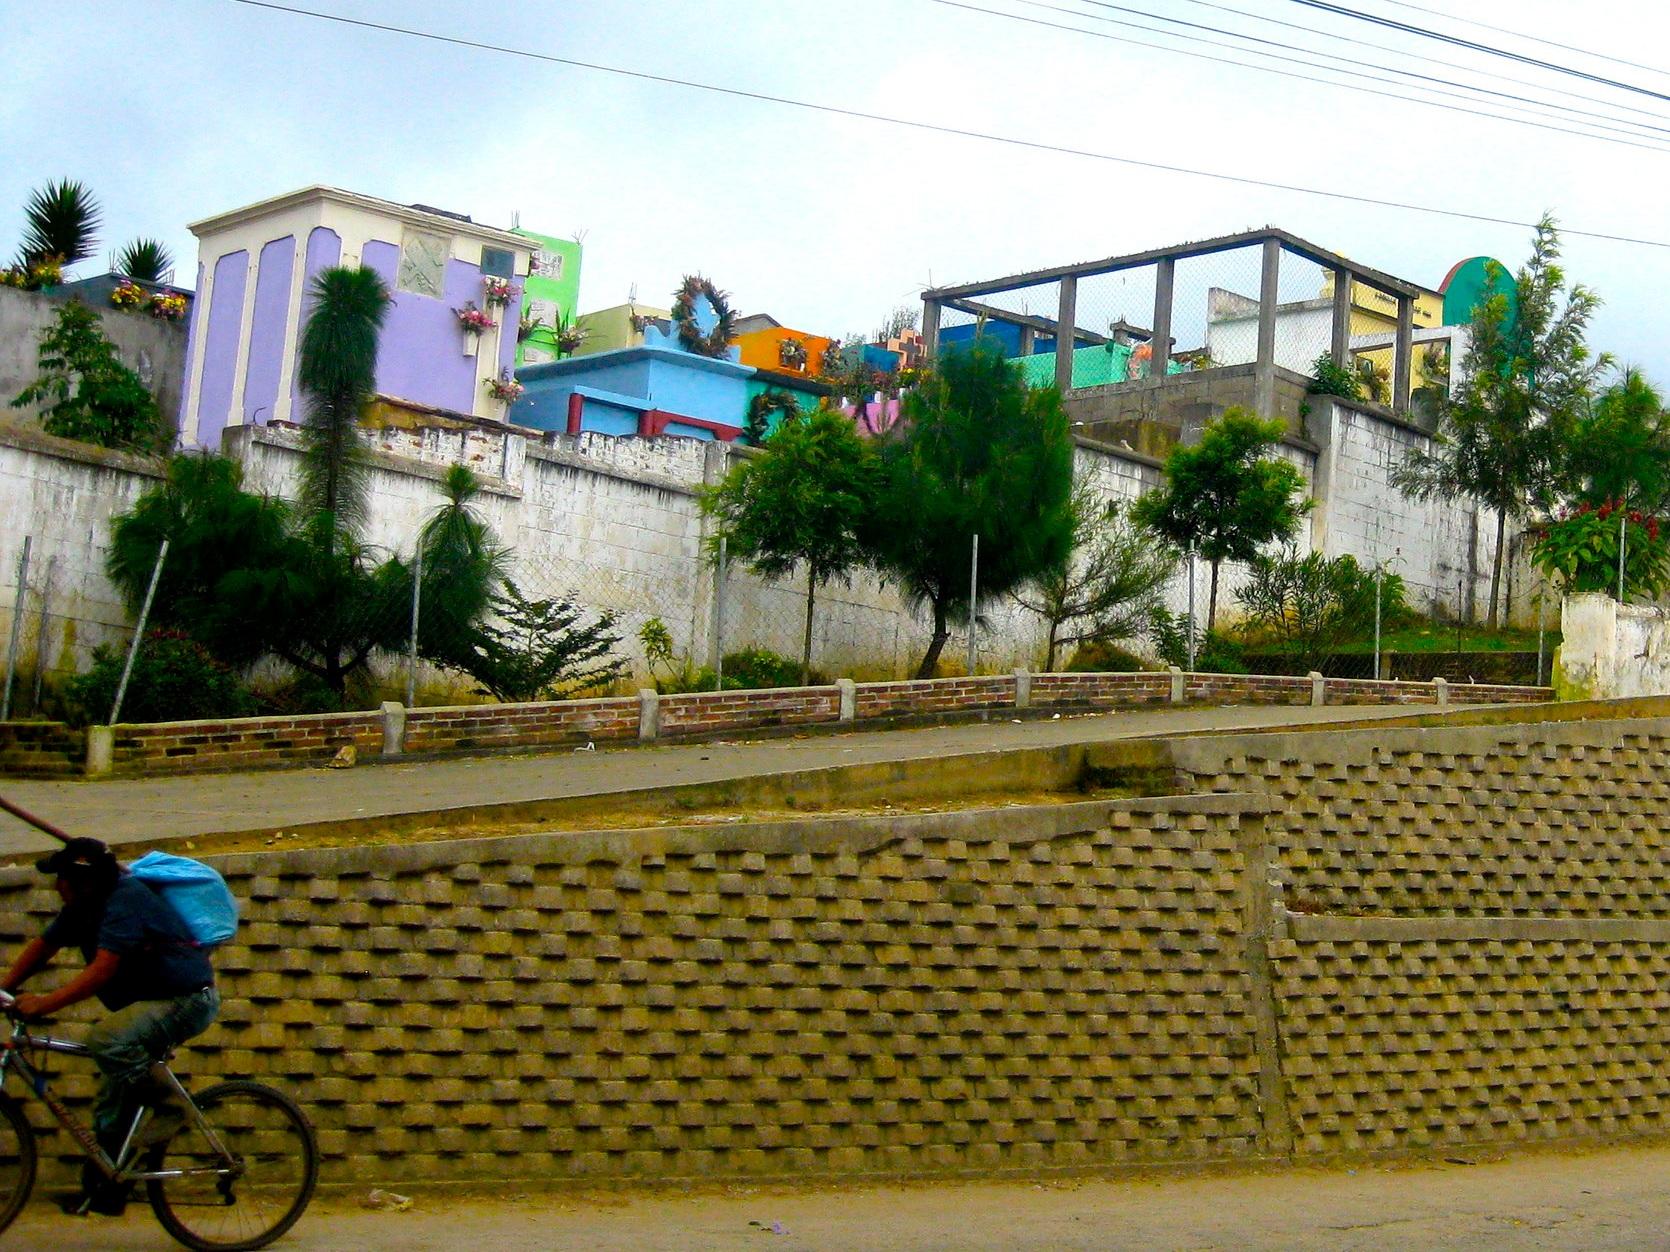 San Juan Comapala, Guatemala, 2013